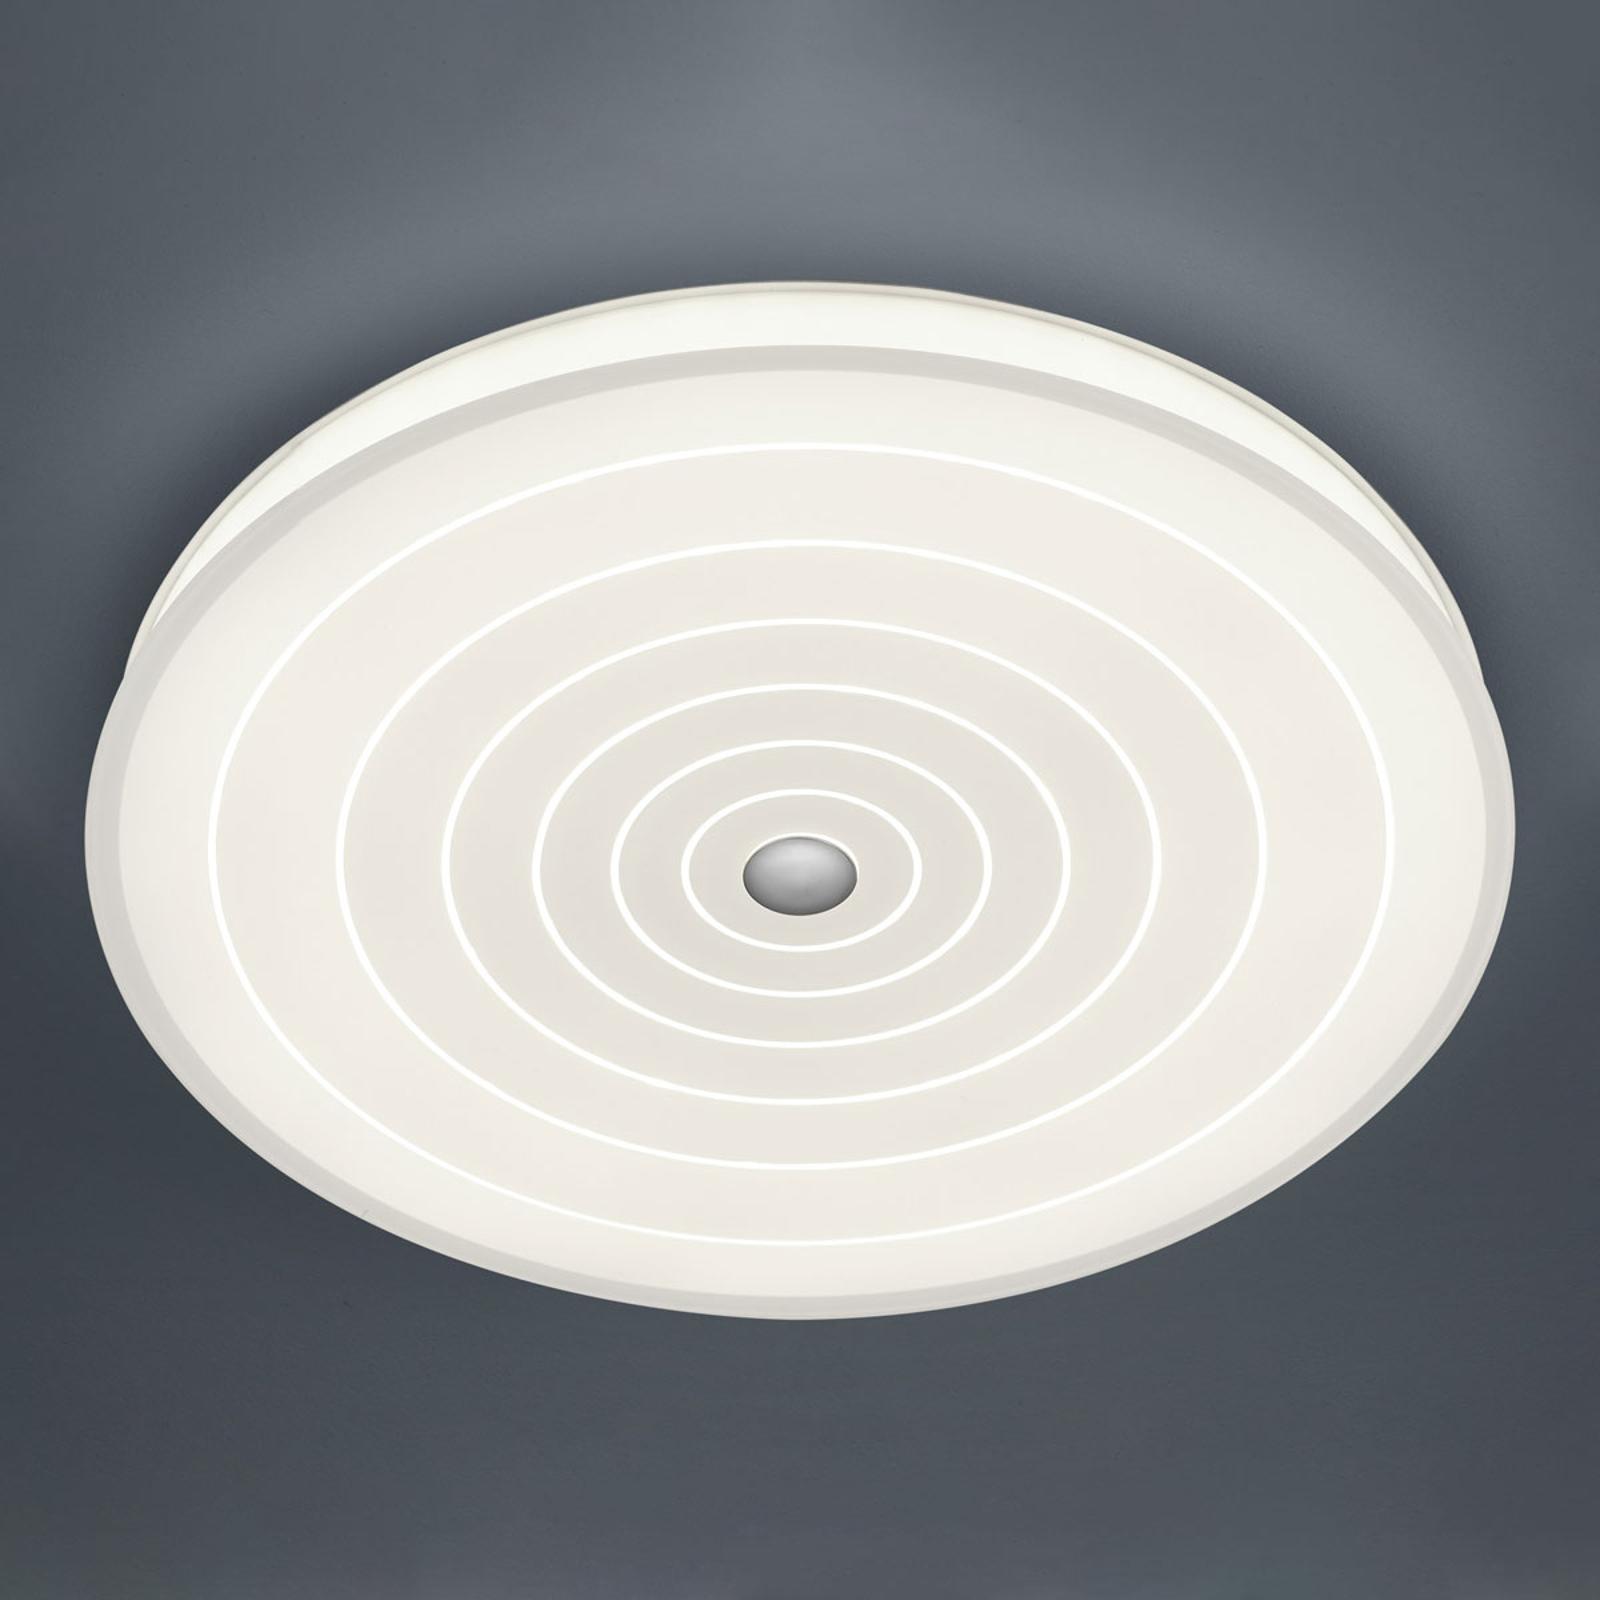 BANKAMP Mandala lampa sufitowa LED okręgi, Ø 52 cm